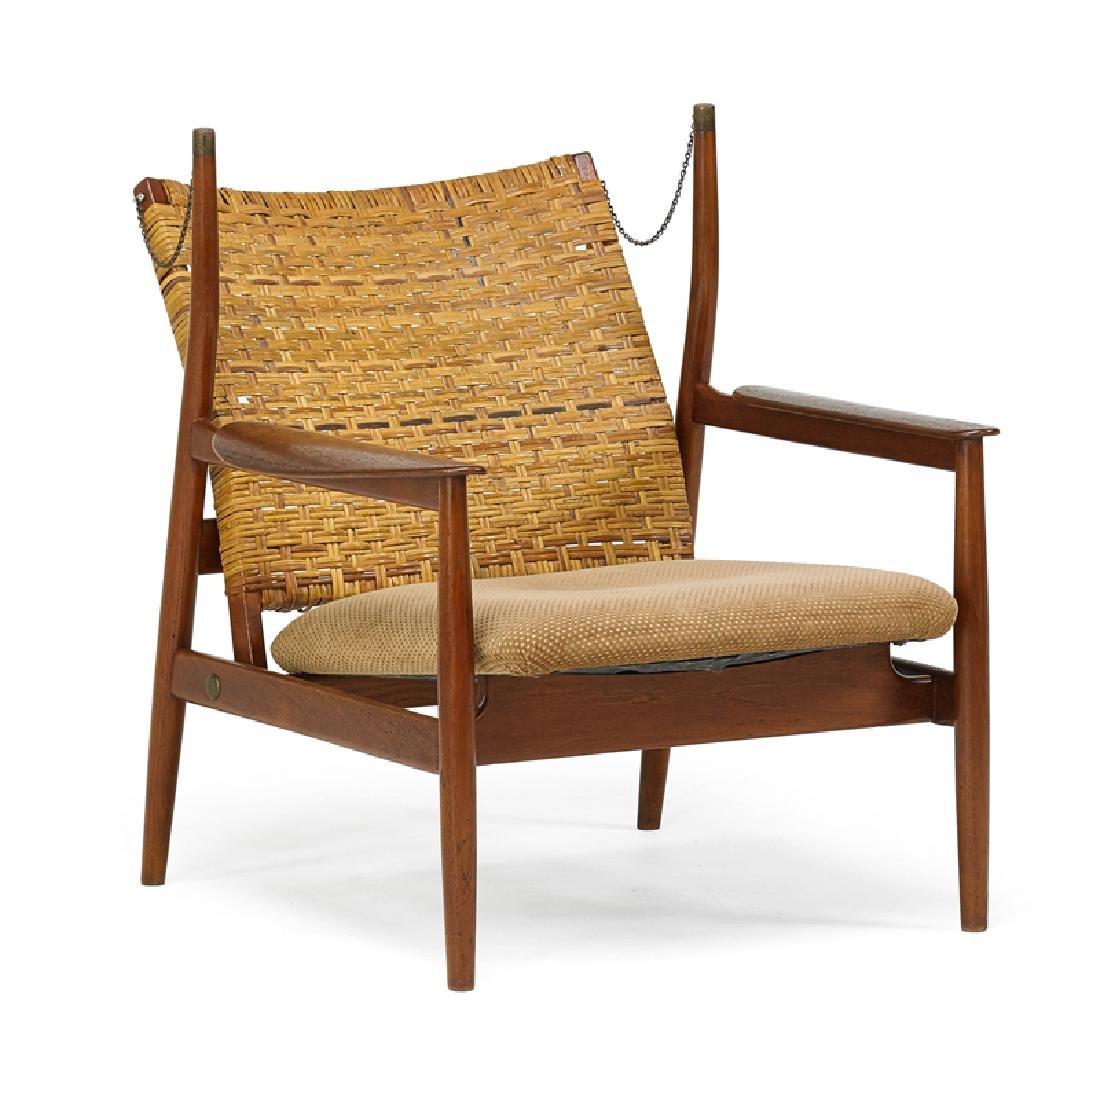 FINN JUHL; NIELS VODDER Adjustable lounge chair